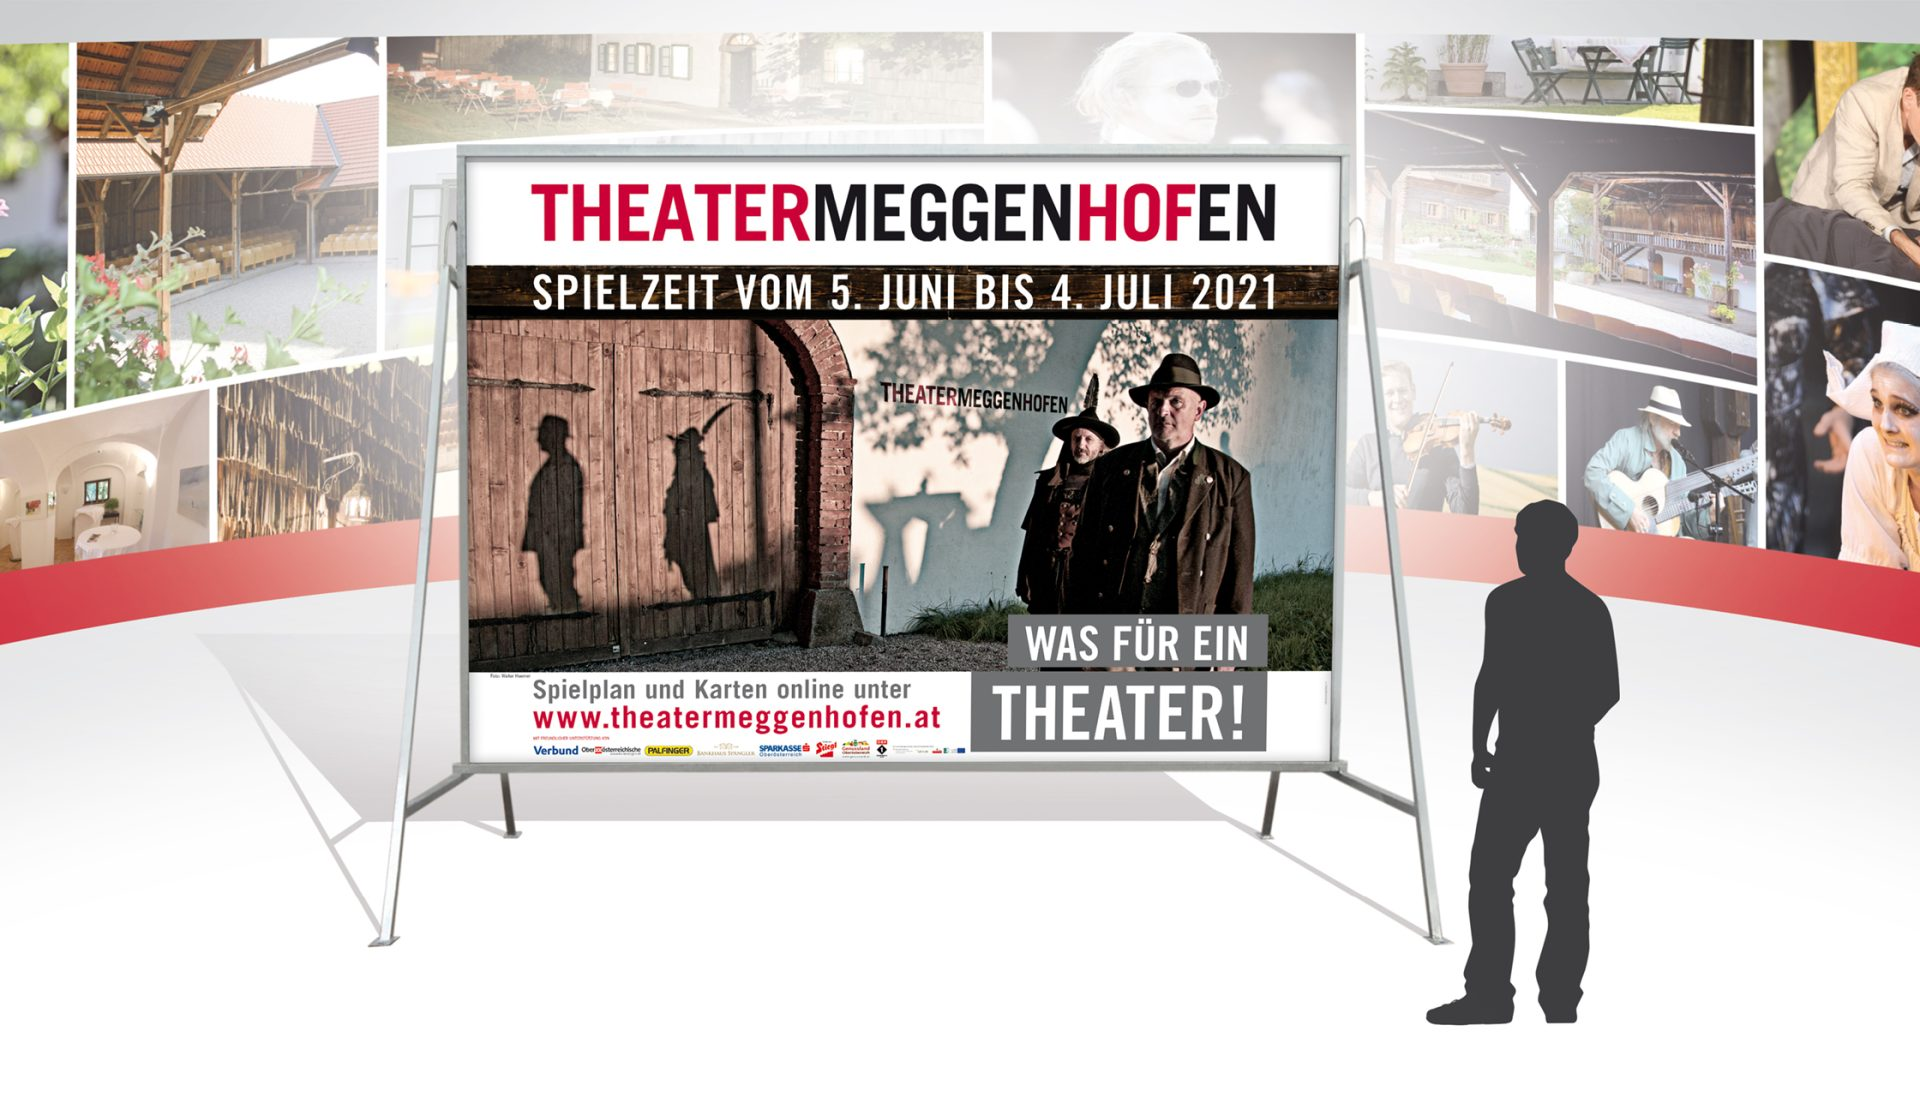 Theater Meggenhofen 16 Bogen Plakat 2021